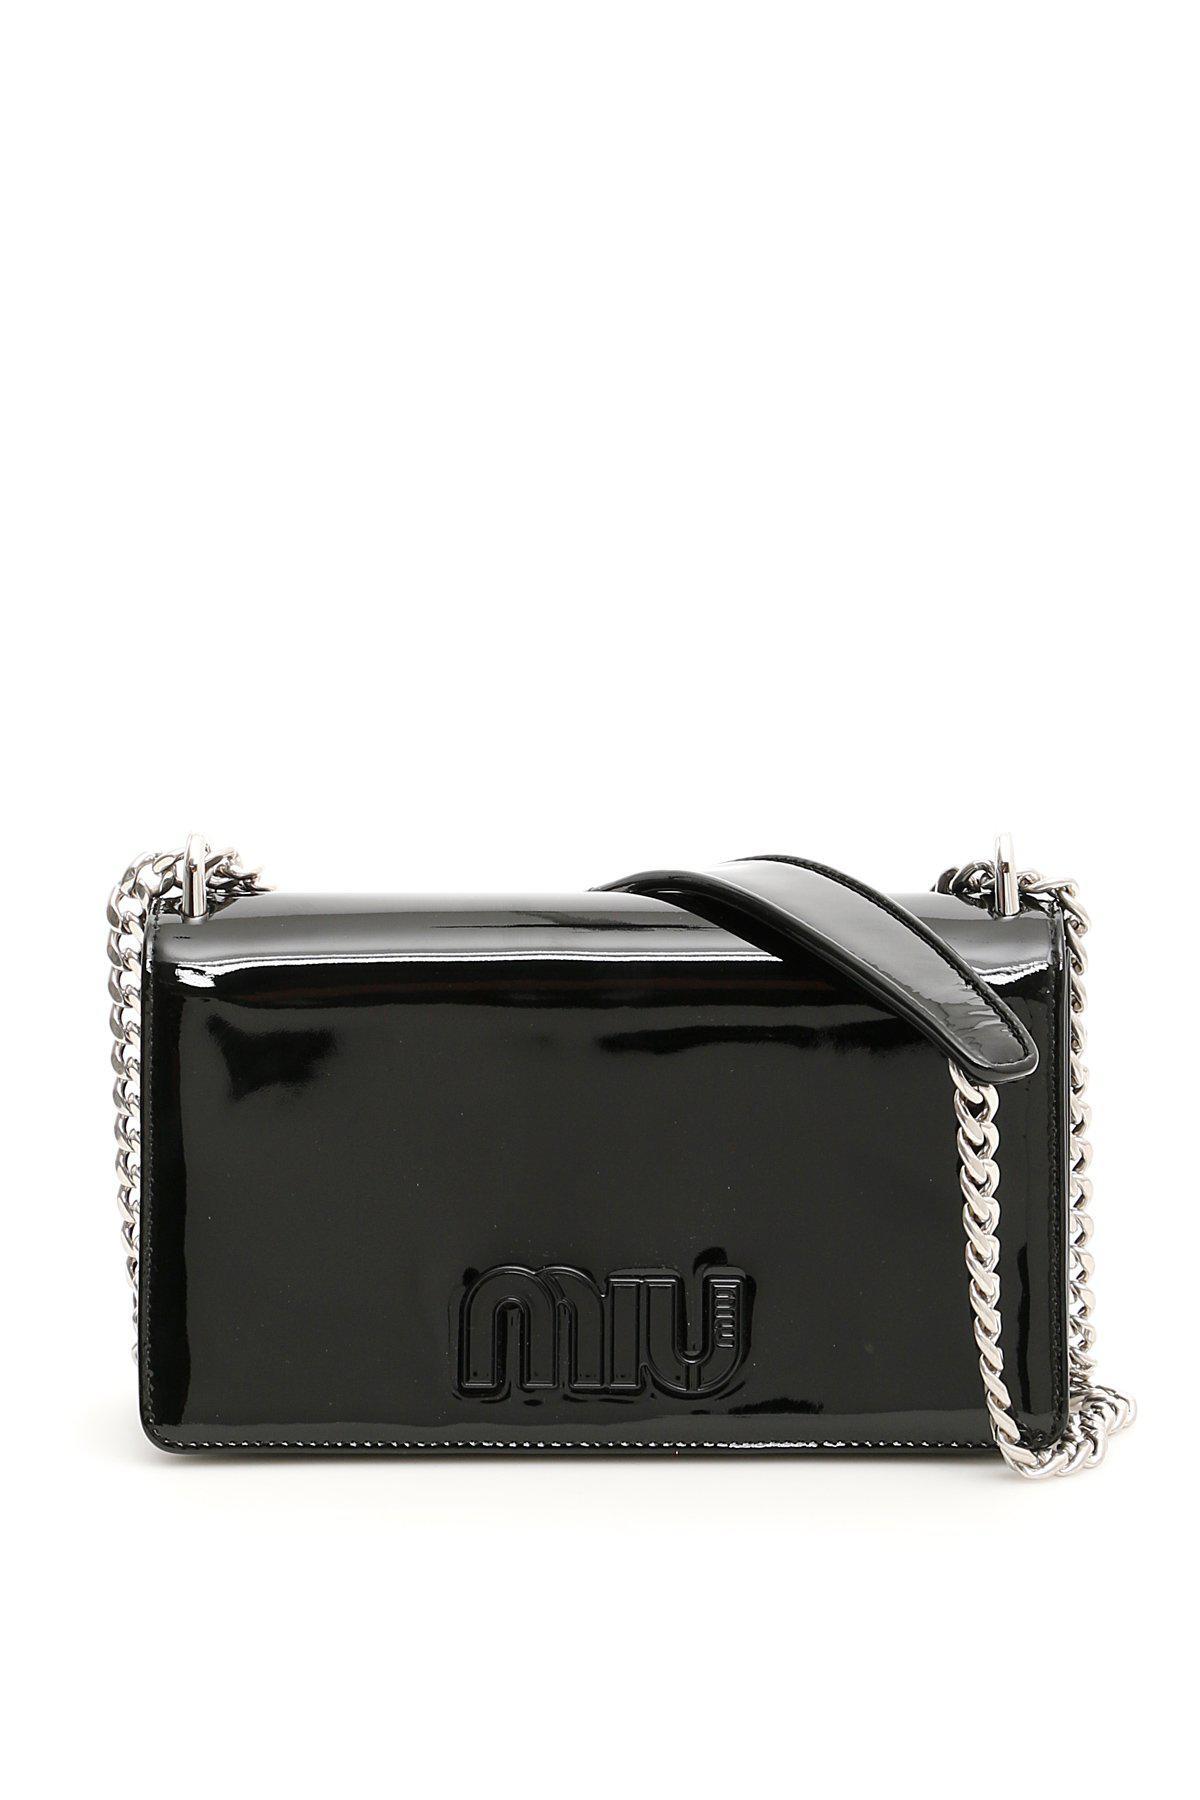 f3144b926494 Miu Miu Patent Logo Crossbody Bag in Black - Lyst